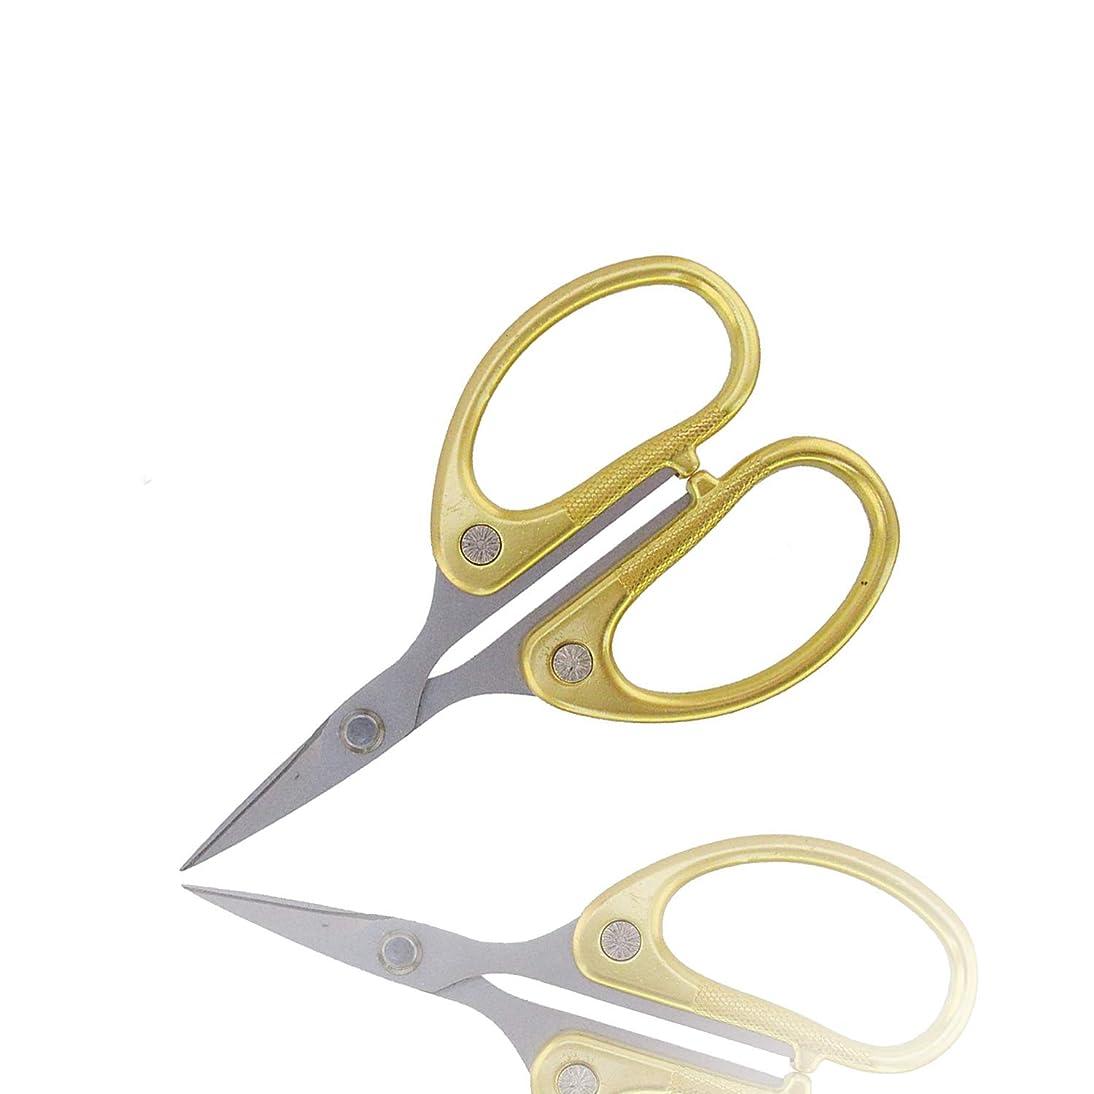 Embroidery Scissors - 4 1/2